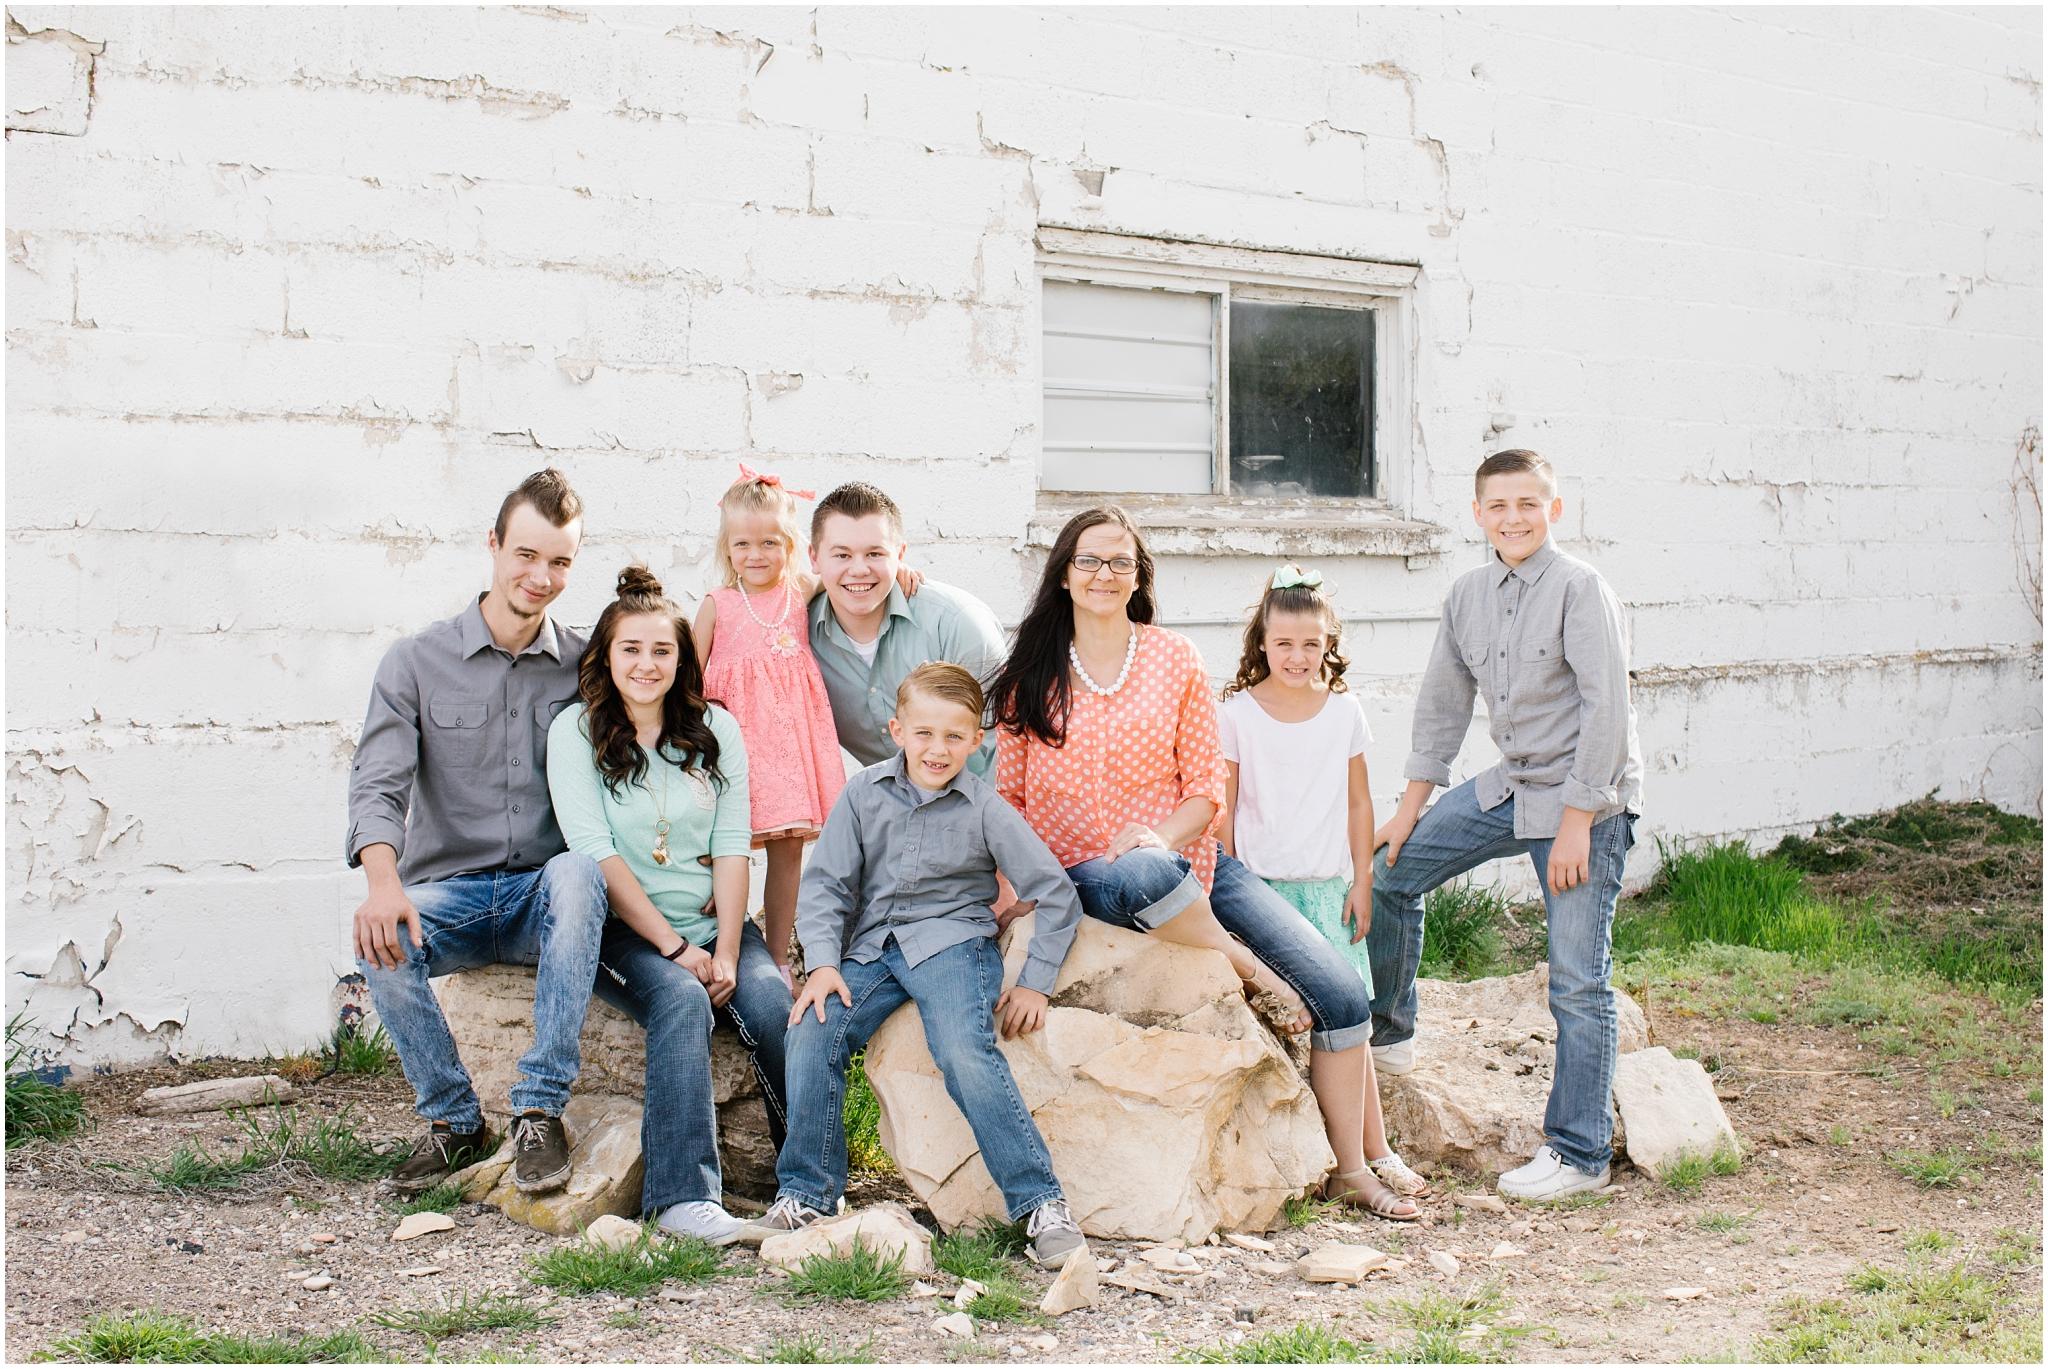 Conner-3_Lizzie-B-Imagery-Utah-Family-Photographer-Salt-Lake-City-Park-City-Utah-County.jpg